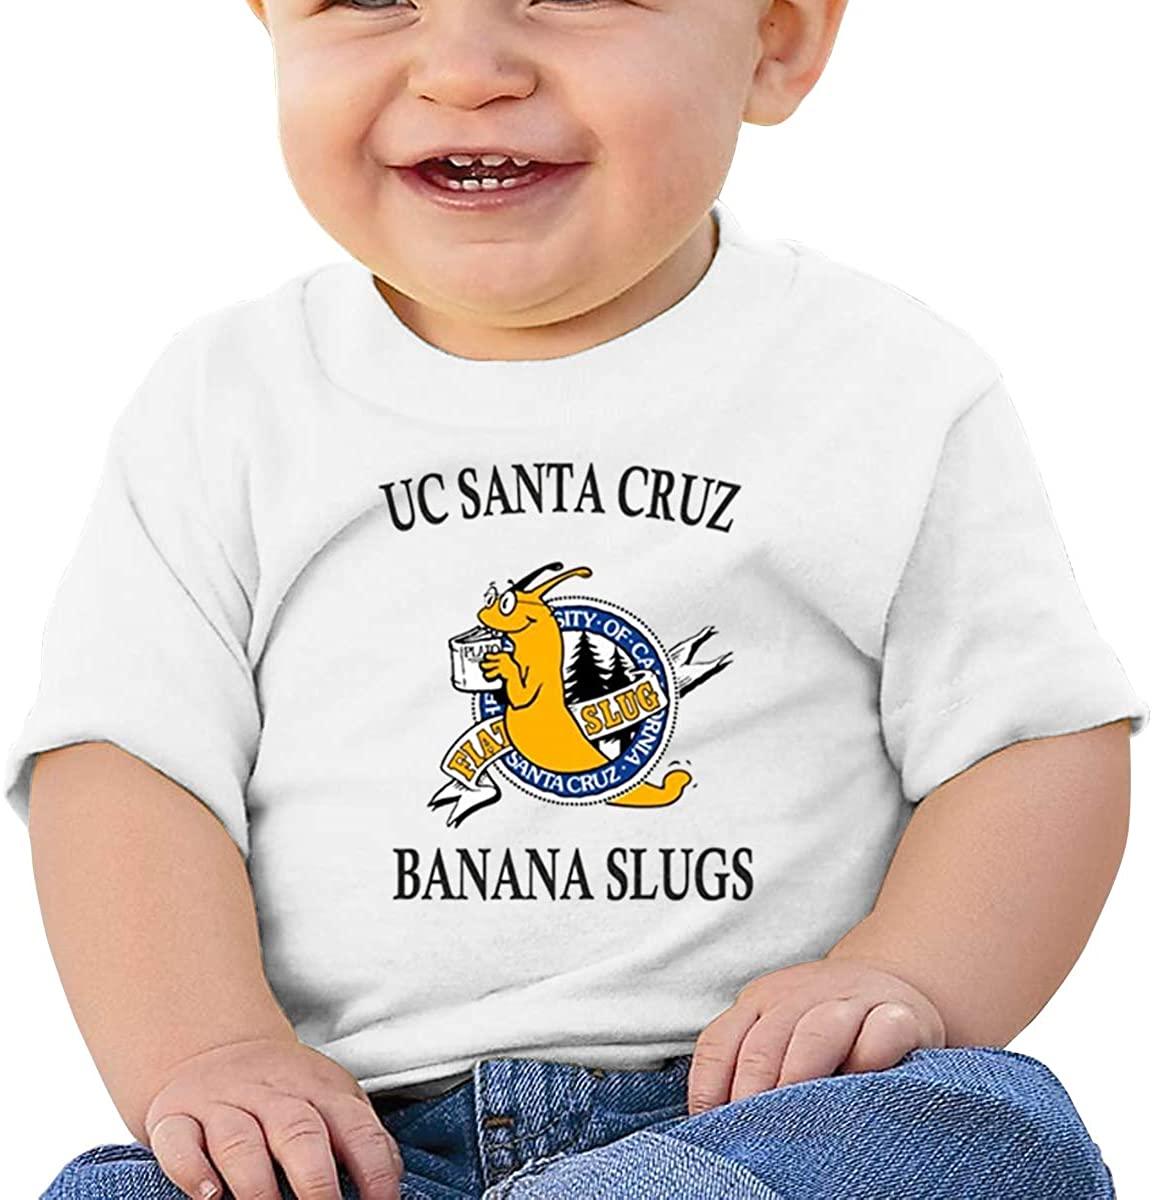 6-24 Months Boy and Girl Baby Short Sleeve T-Shirt Uc Santa Cruz Banana Slug Elegant and Simple Design White